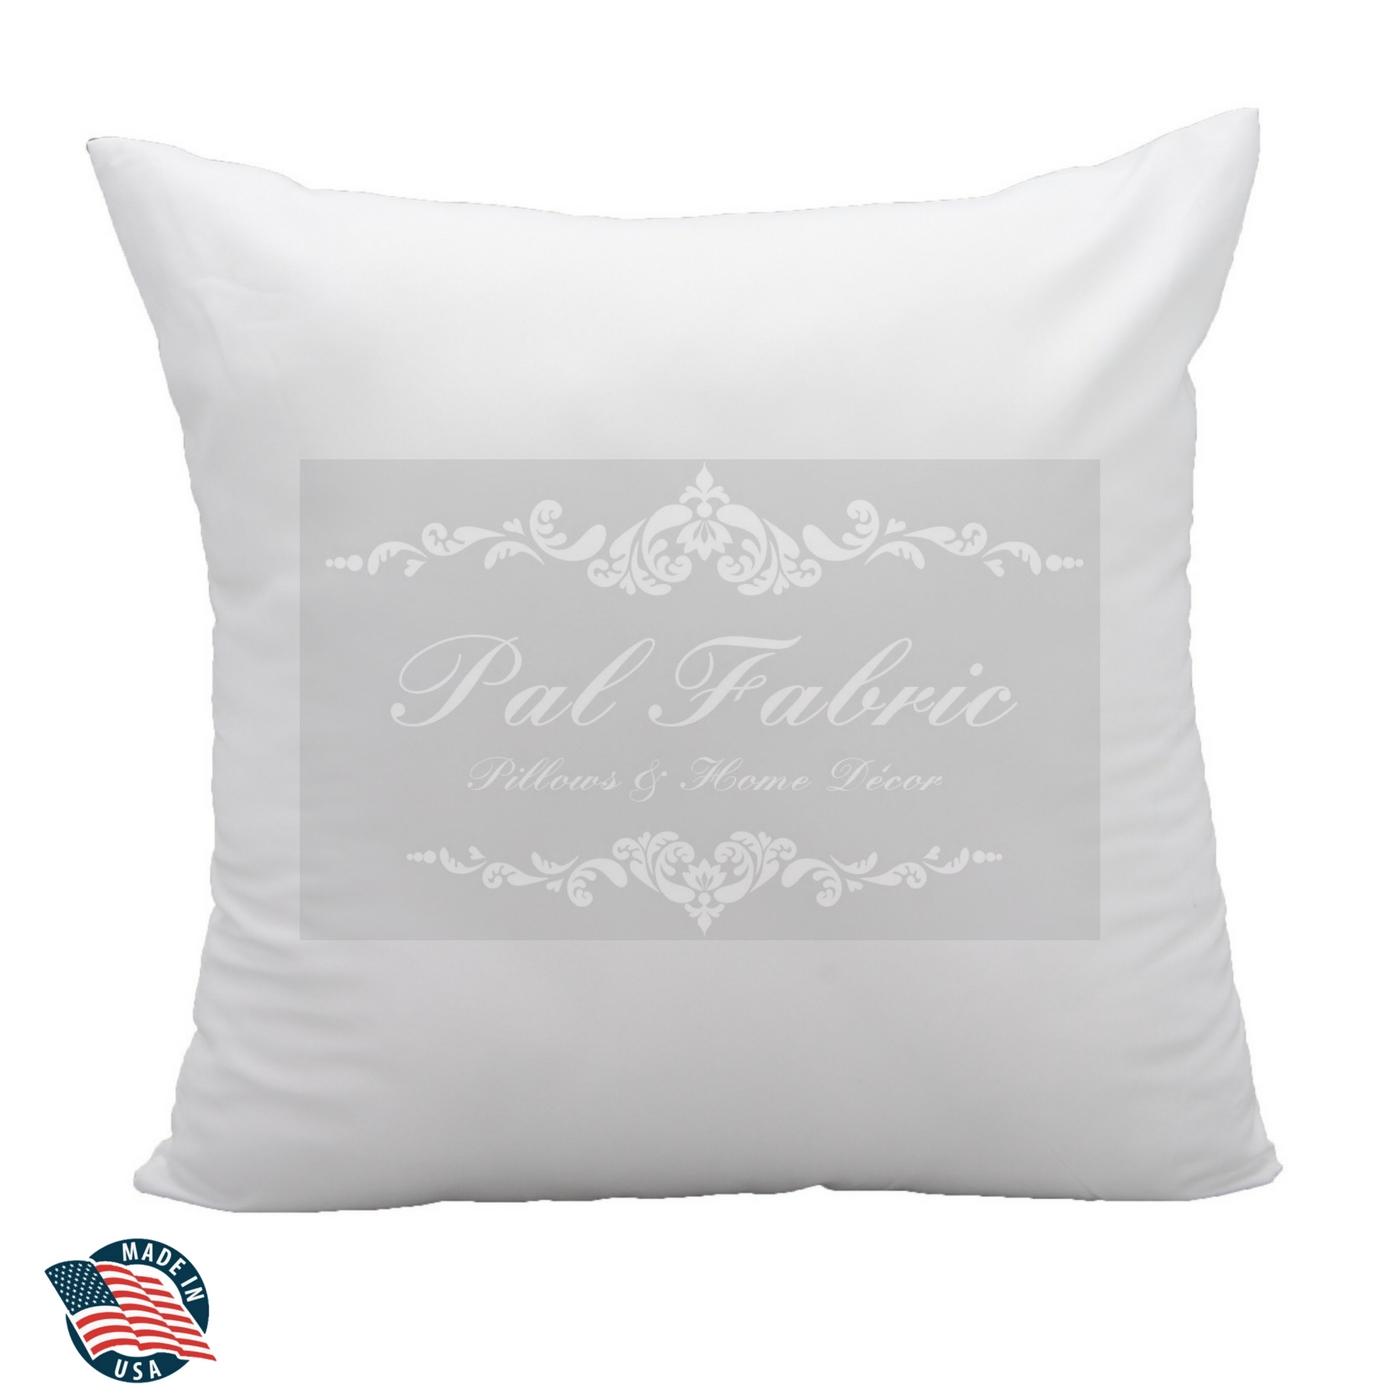 Popular Sham Or Decorative Pillow Cover 18x18 Pillow Insert Hobby Lobby 18x18 Pillow Insert Amazon Pal Fabric Pillow Insert Sham Or Decorative Pillow Piece Pal Fabric Pillow Insert houzz-03 18x18 Pillow Insert